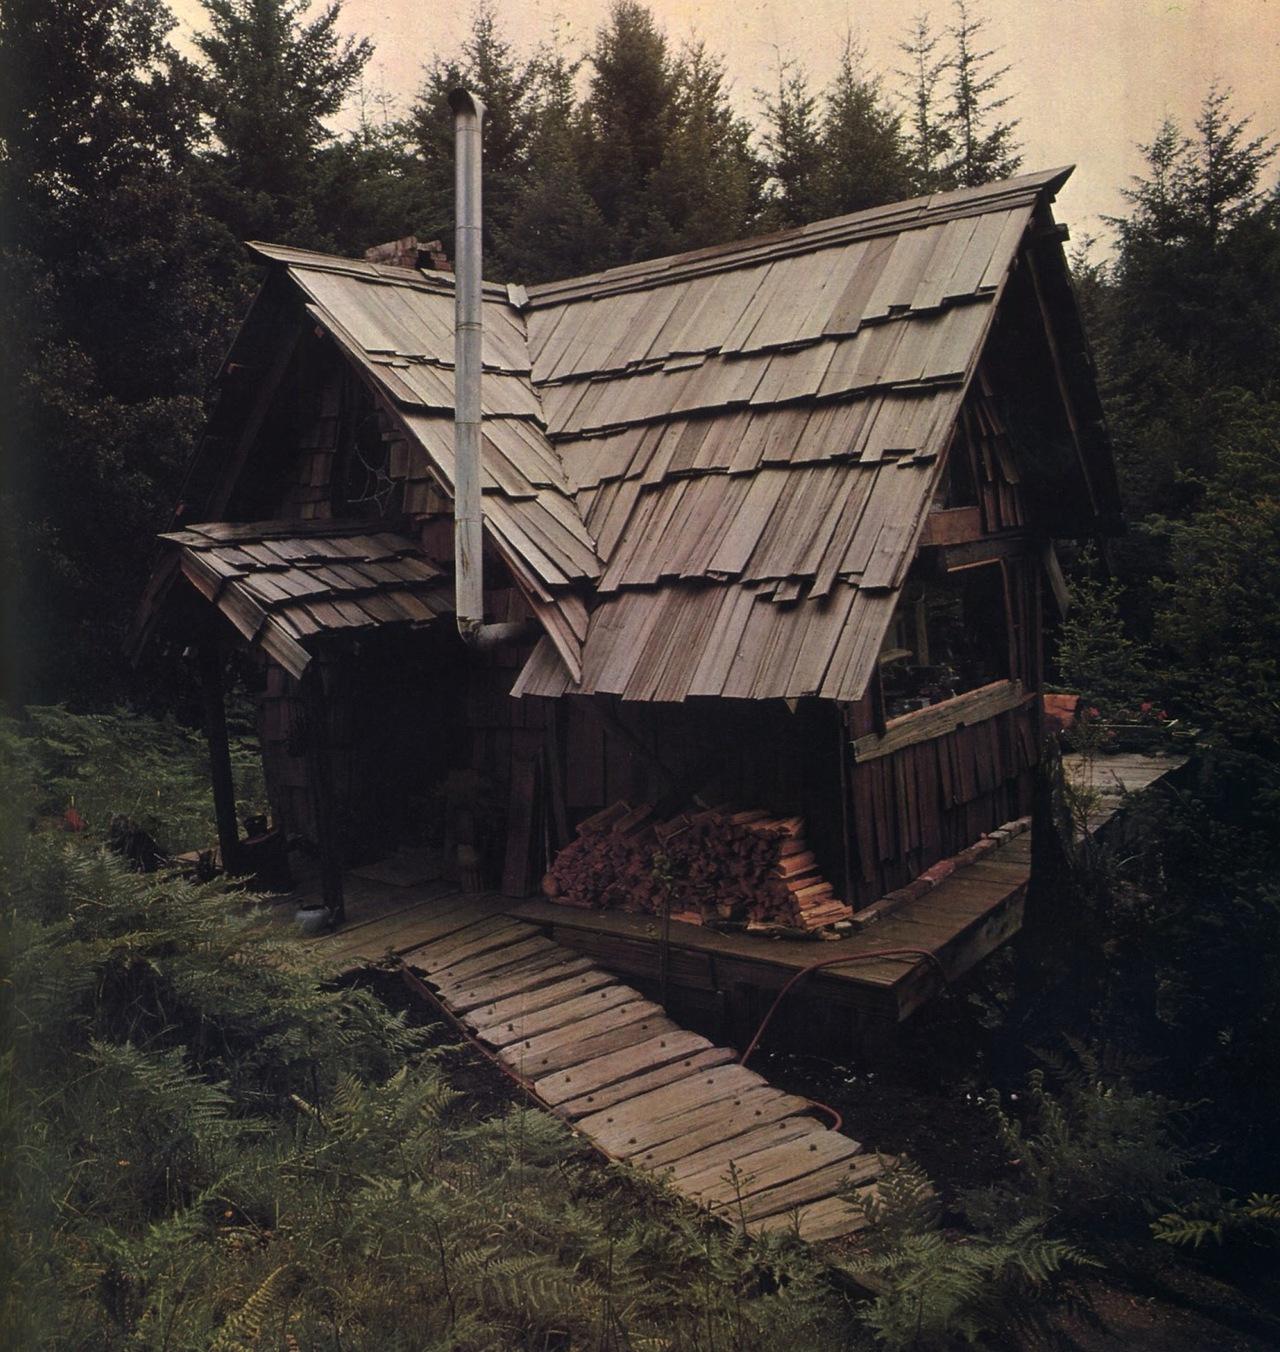 Handmade Houses by Art Boericke and Barry Shapiro